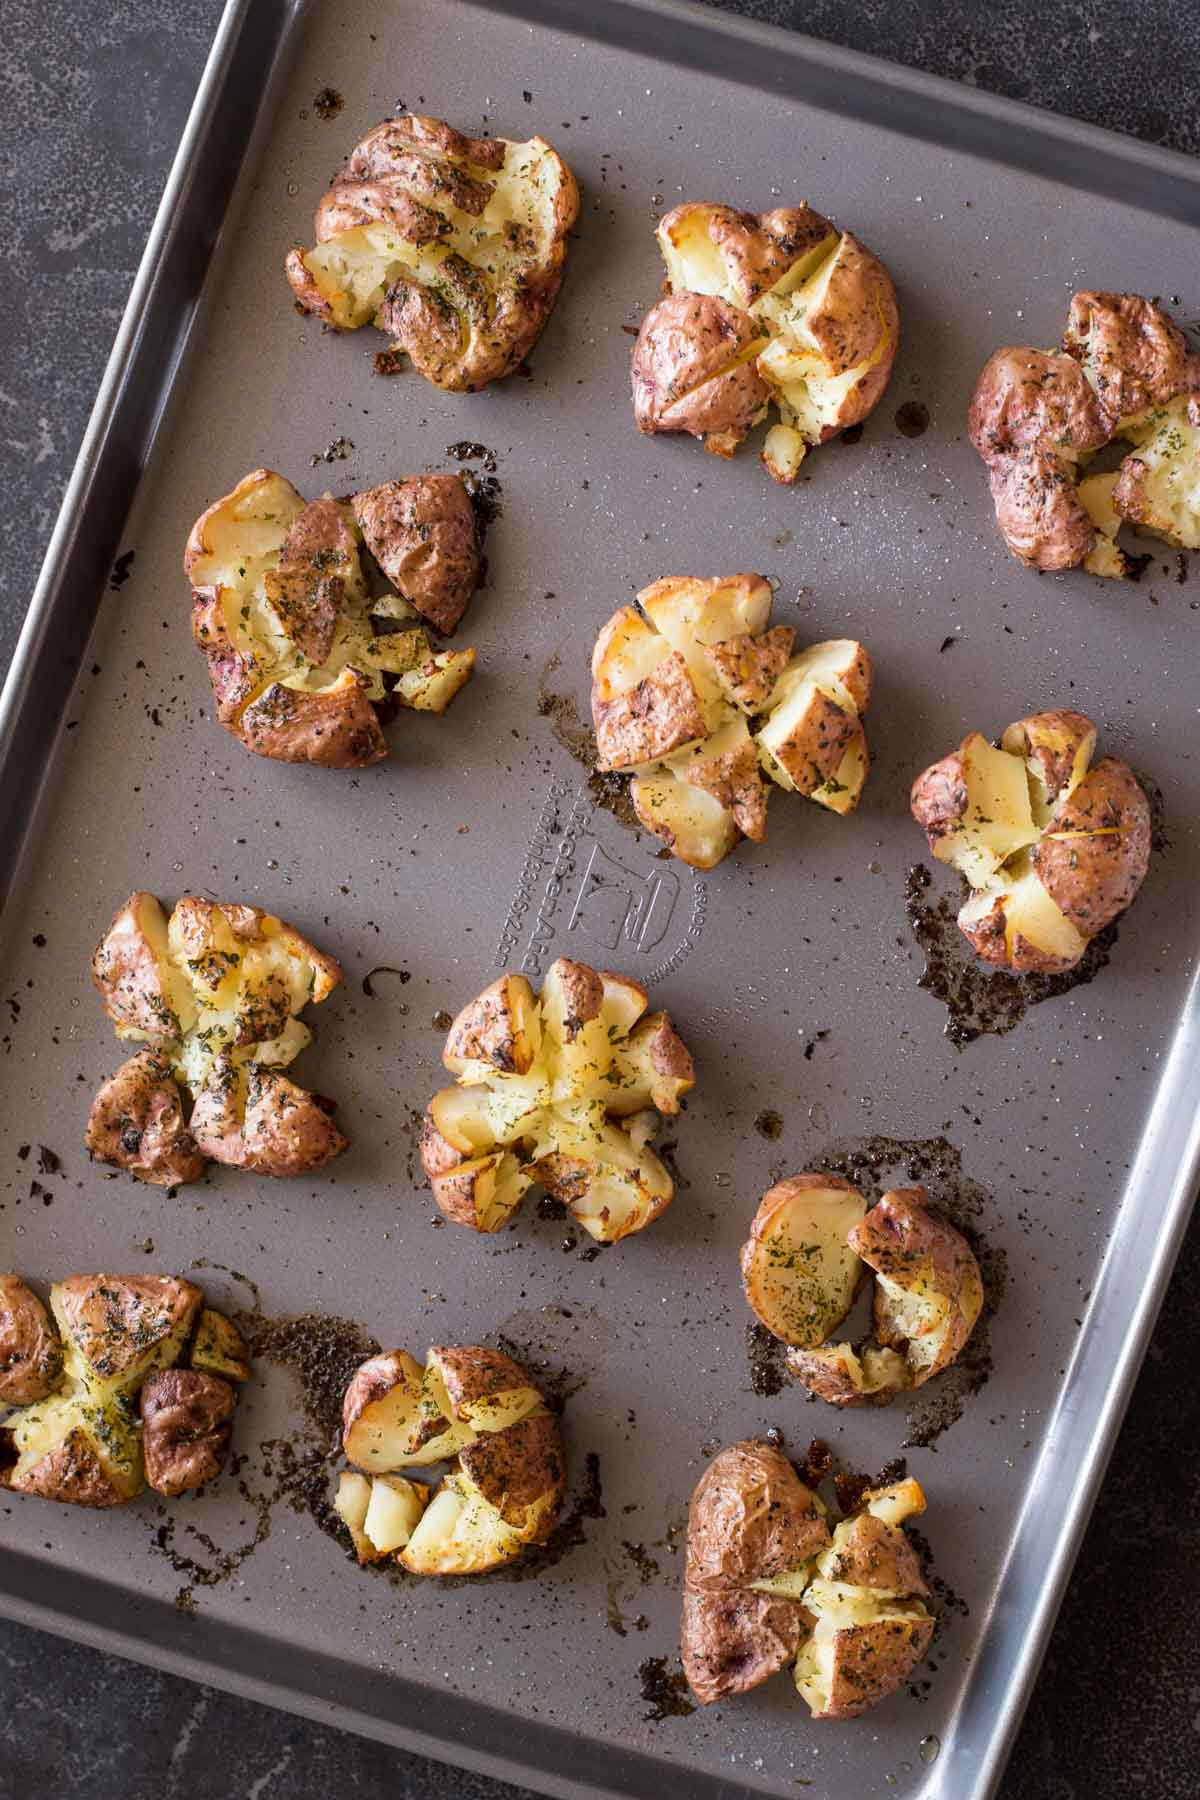 Smashed and Roasted Parmesan Potatoes on a baking sheet.